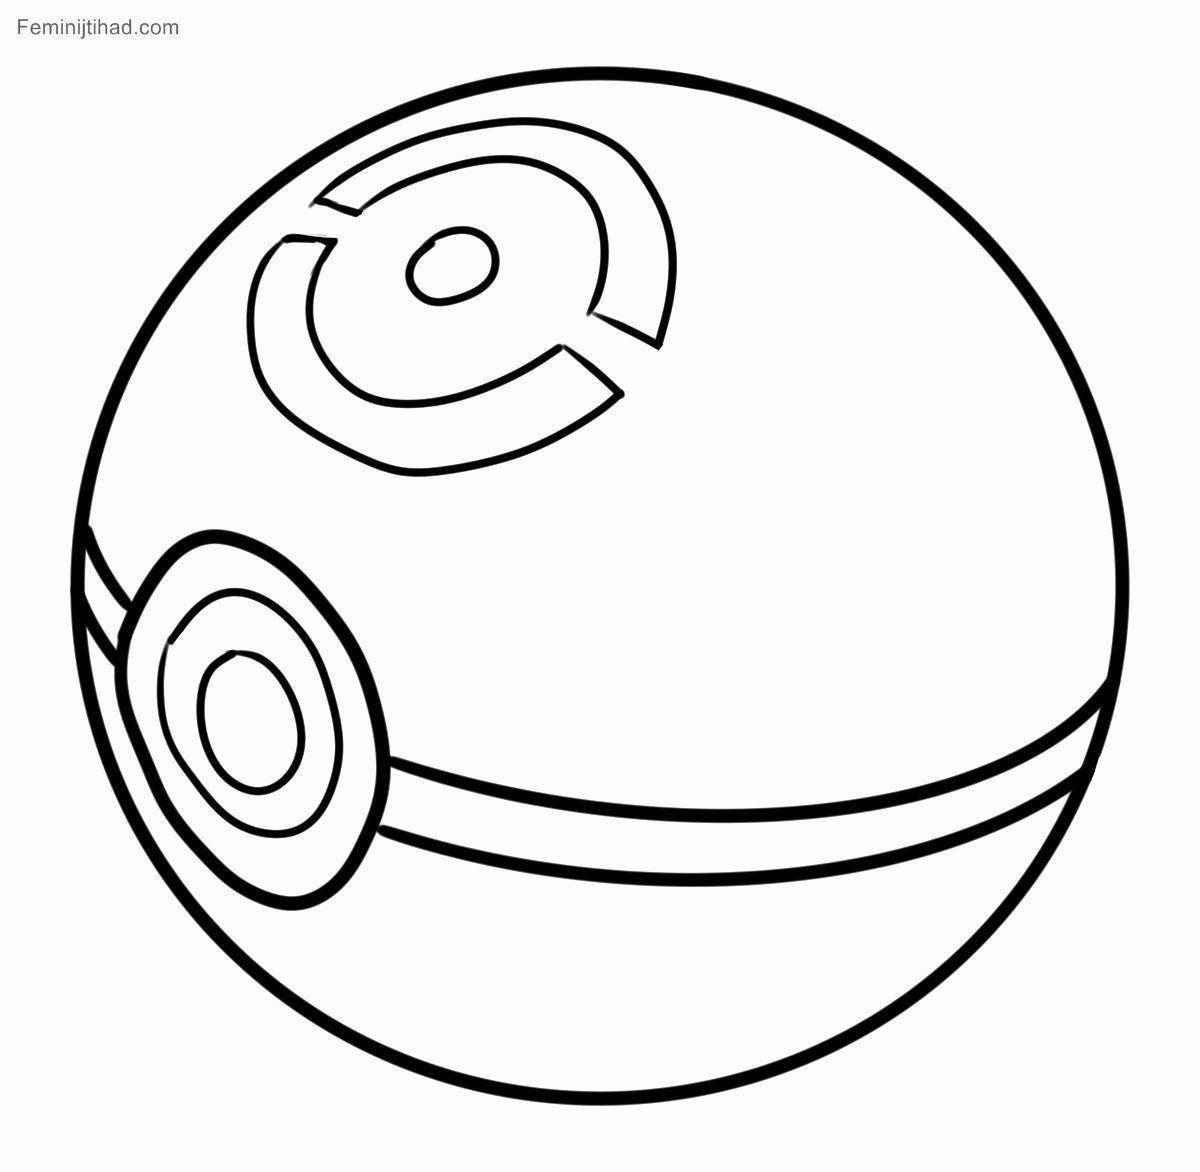 Pokemon Ball Coloring Page Awesome Pokemon Ball Drawing Pikachu Coloring Page Coloring Pages Pokemon Ball